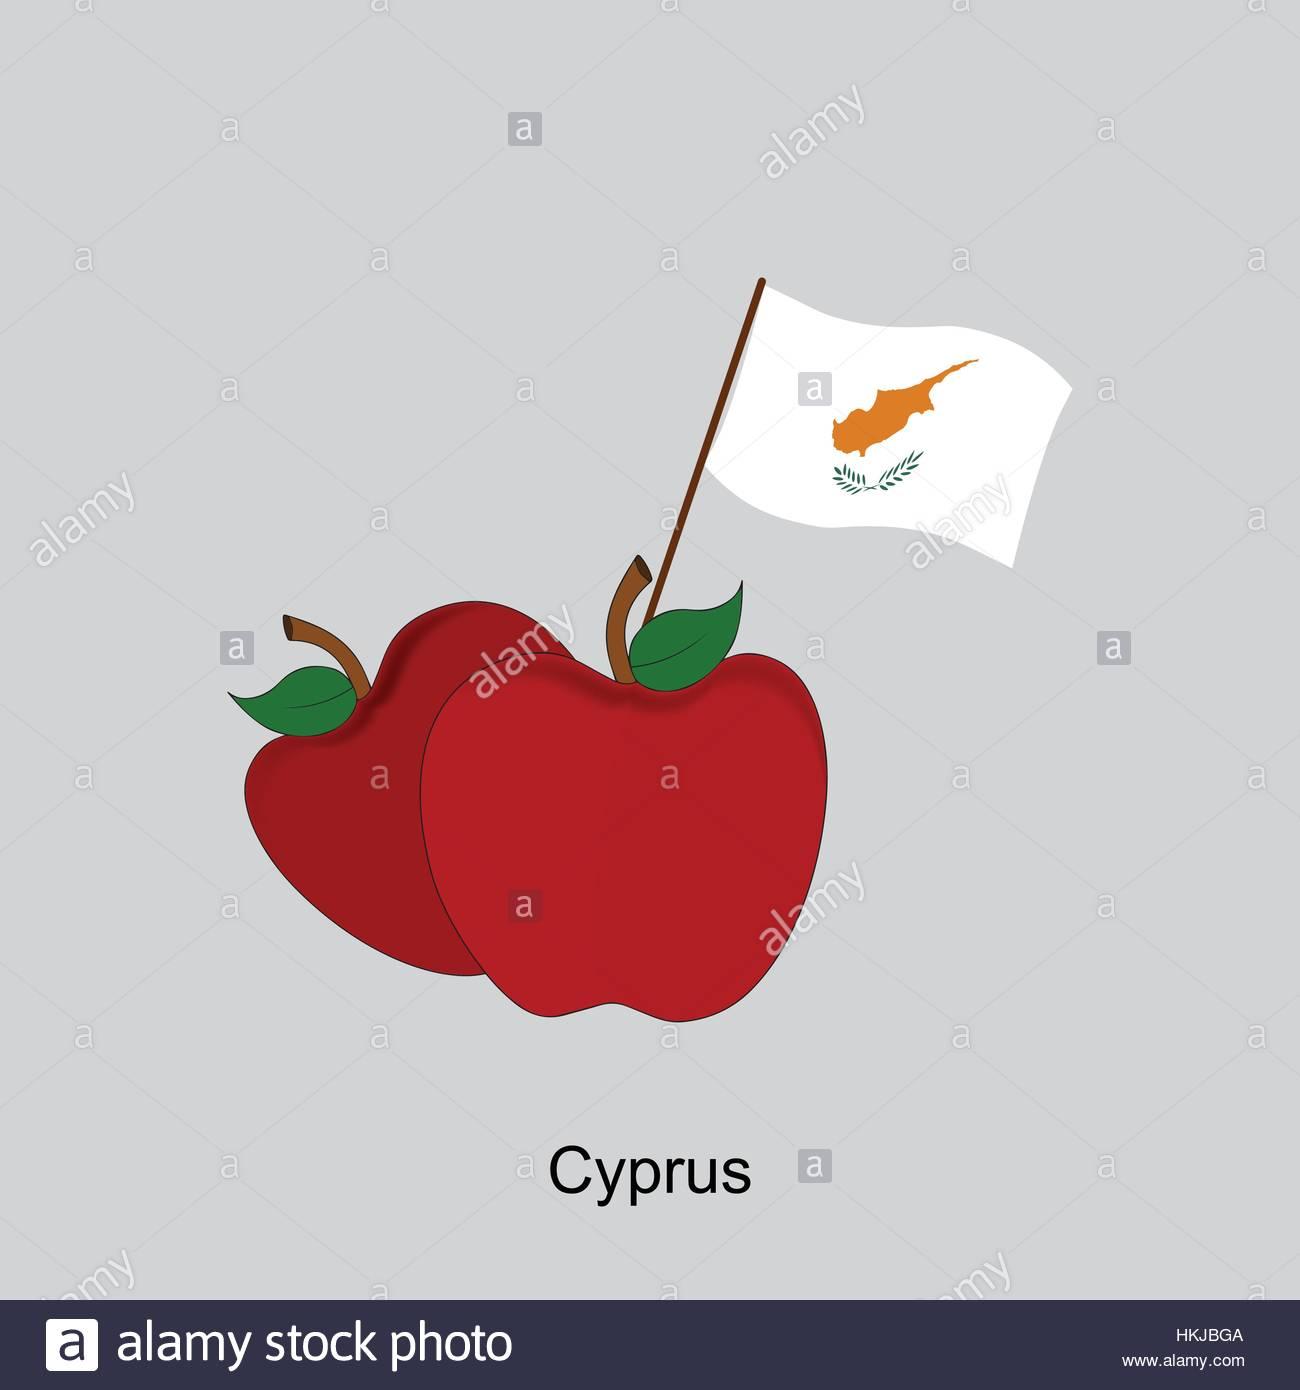 Illustration of Apple, Cyprus Flag, Apple with Cyprus Flag - Stock Image